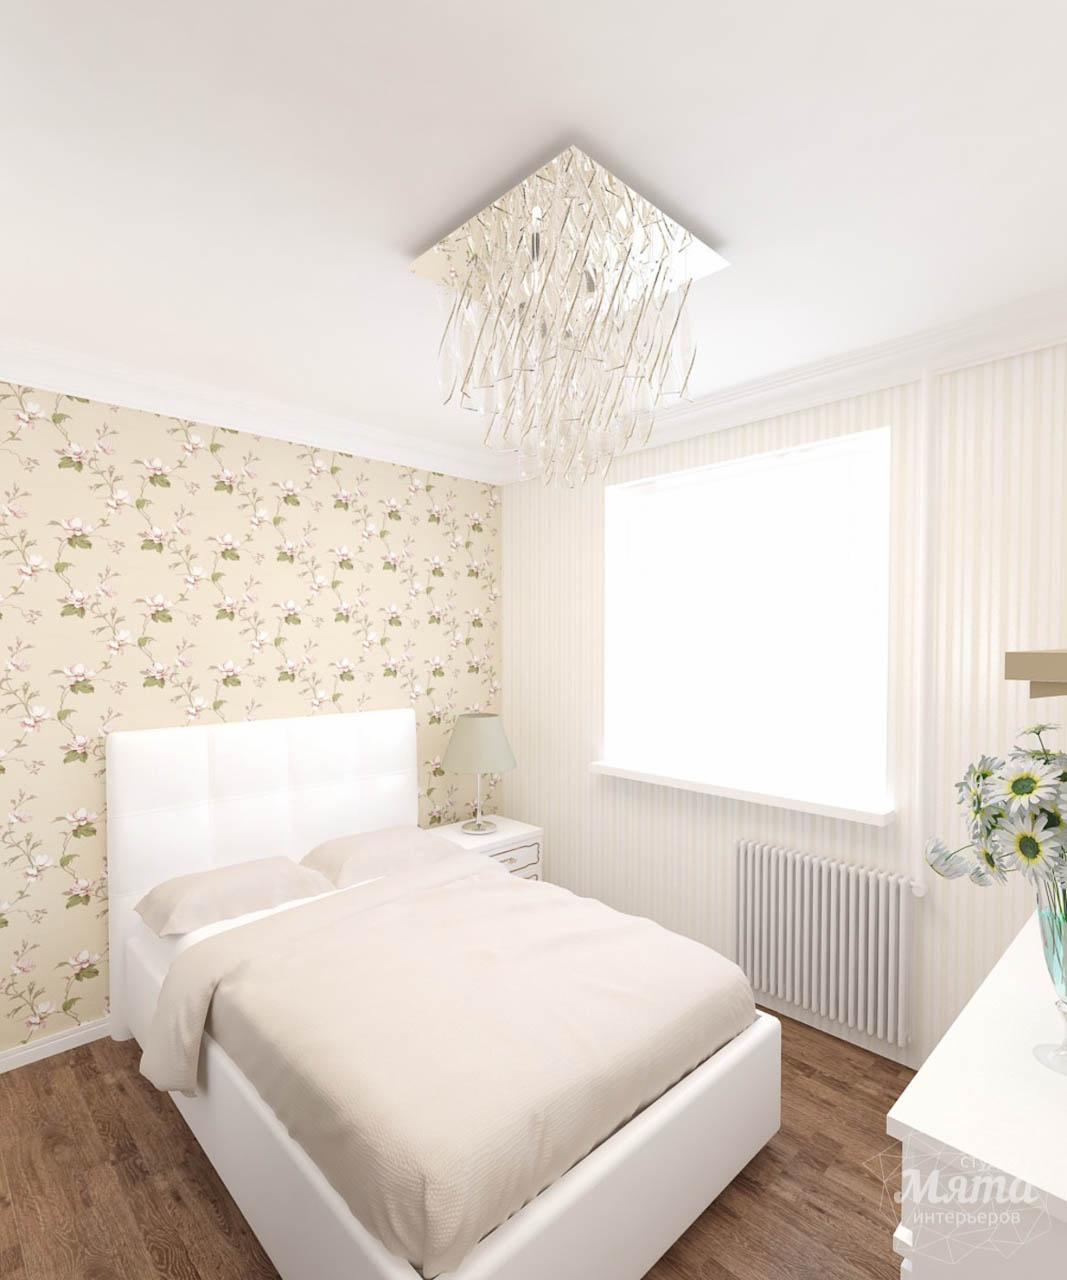 Дизайн интерьера и ремонт однокомнатной квартиры по ул. Бажова 134 img188225314